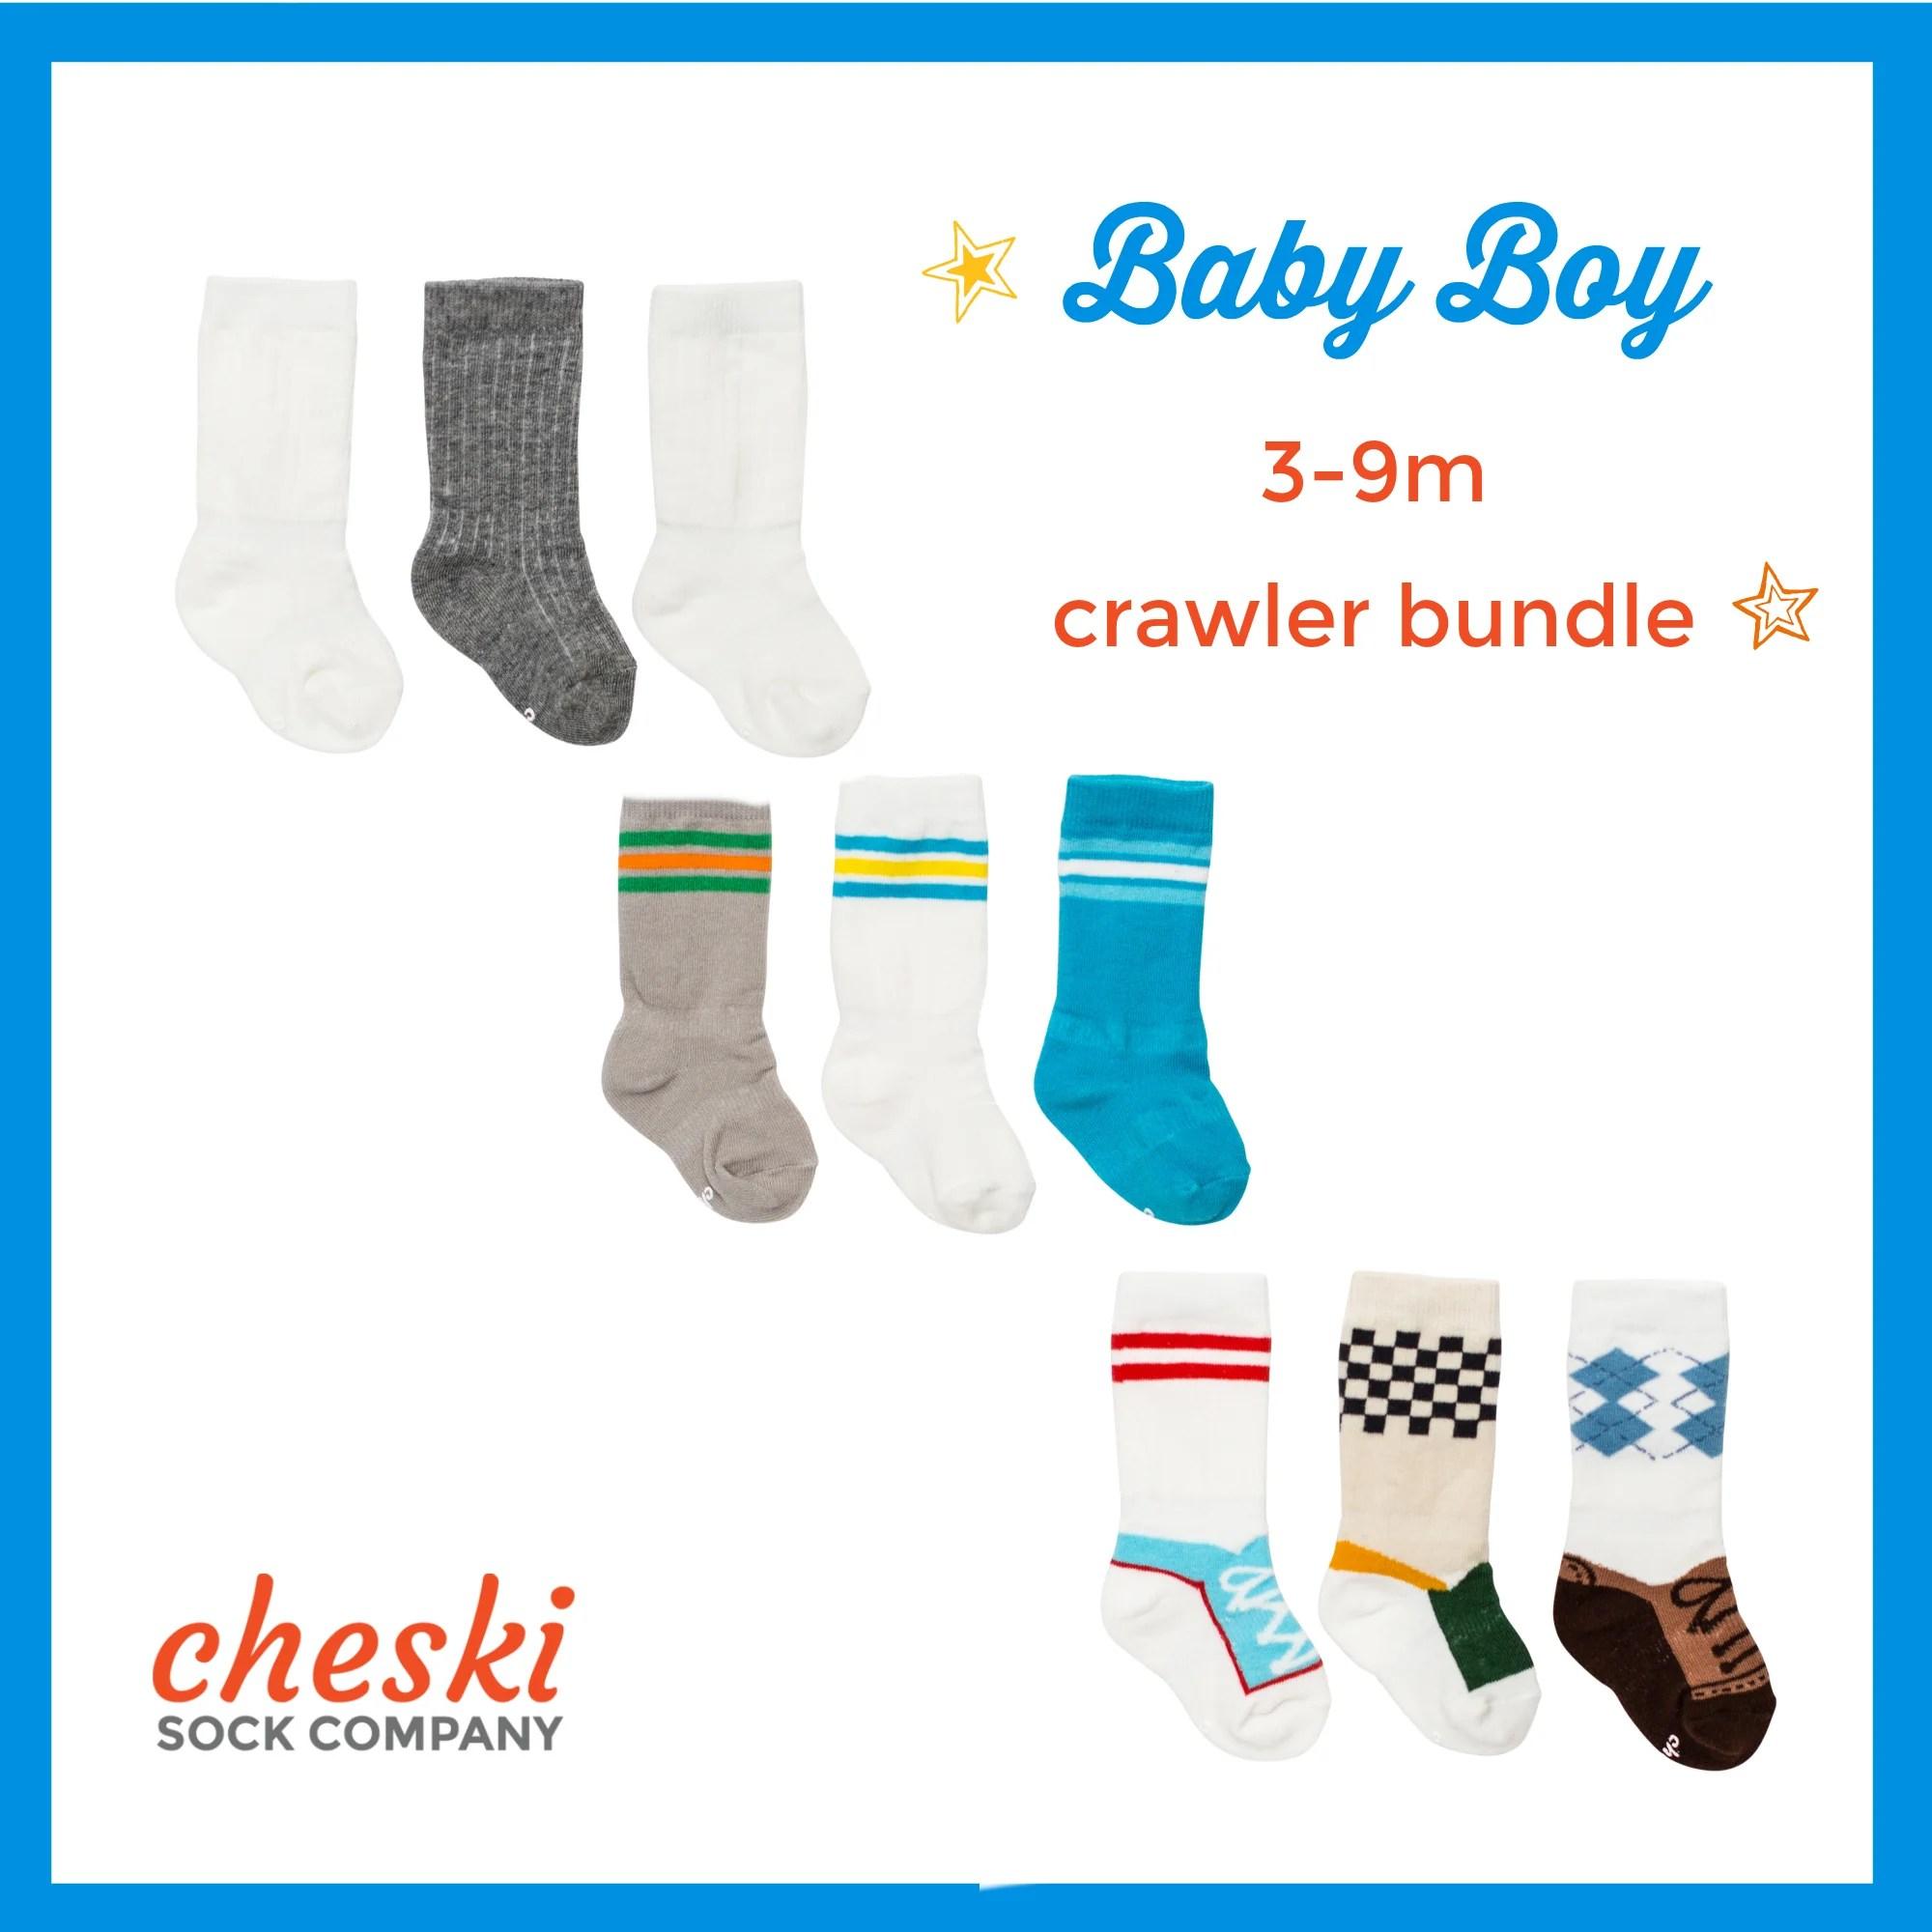 box sets cheski sock company